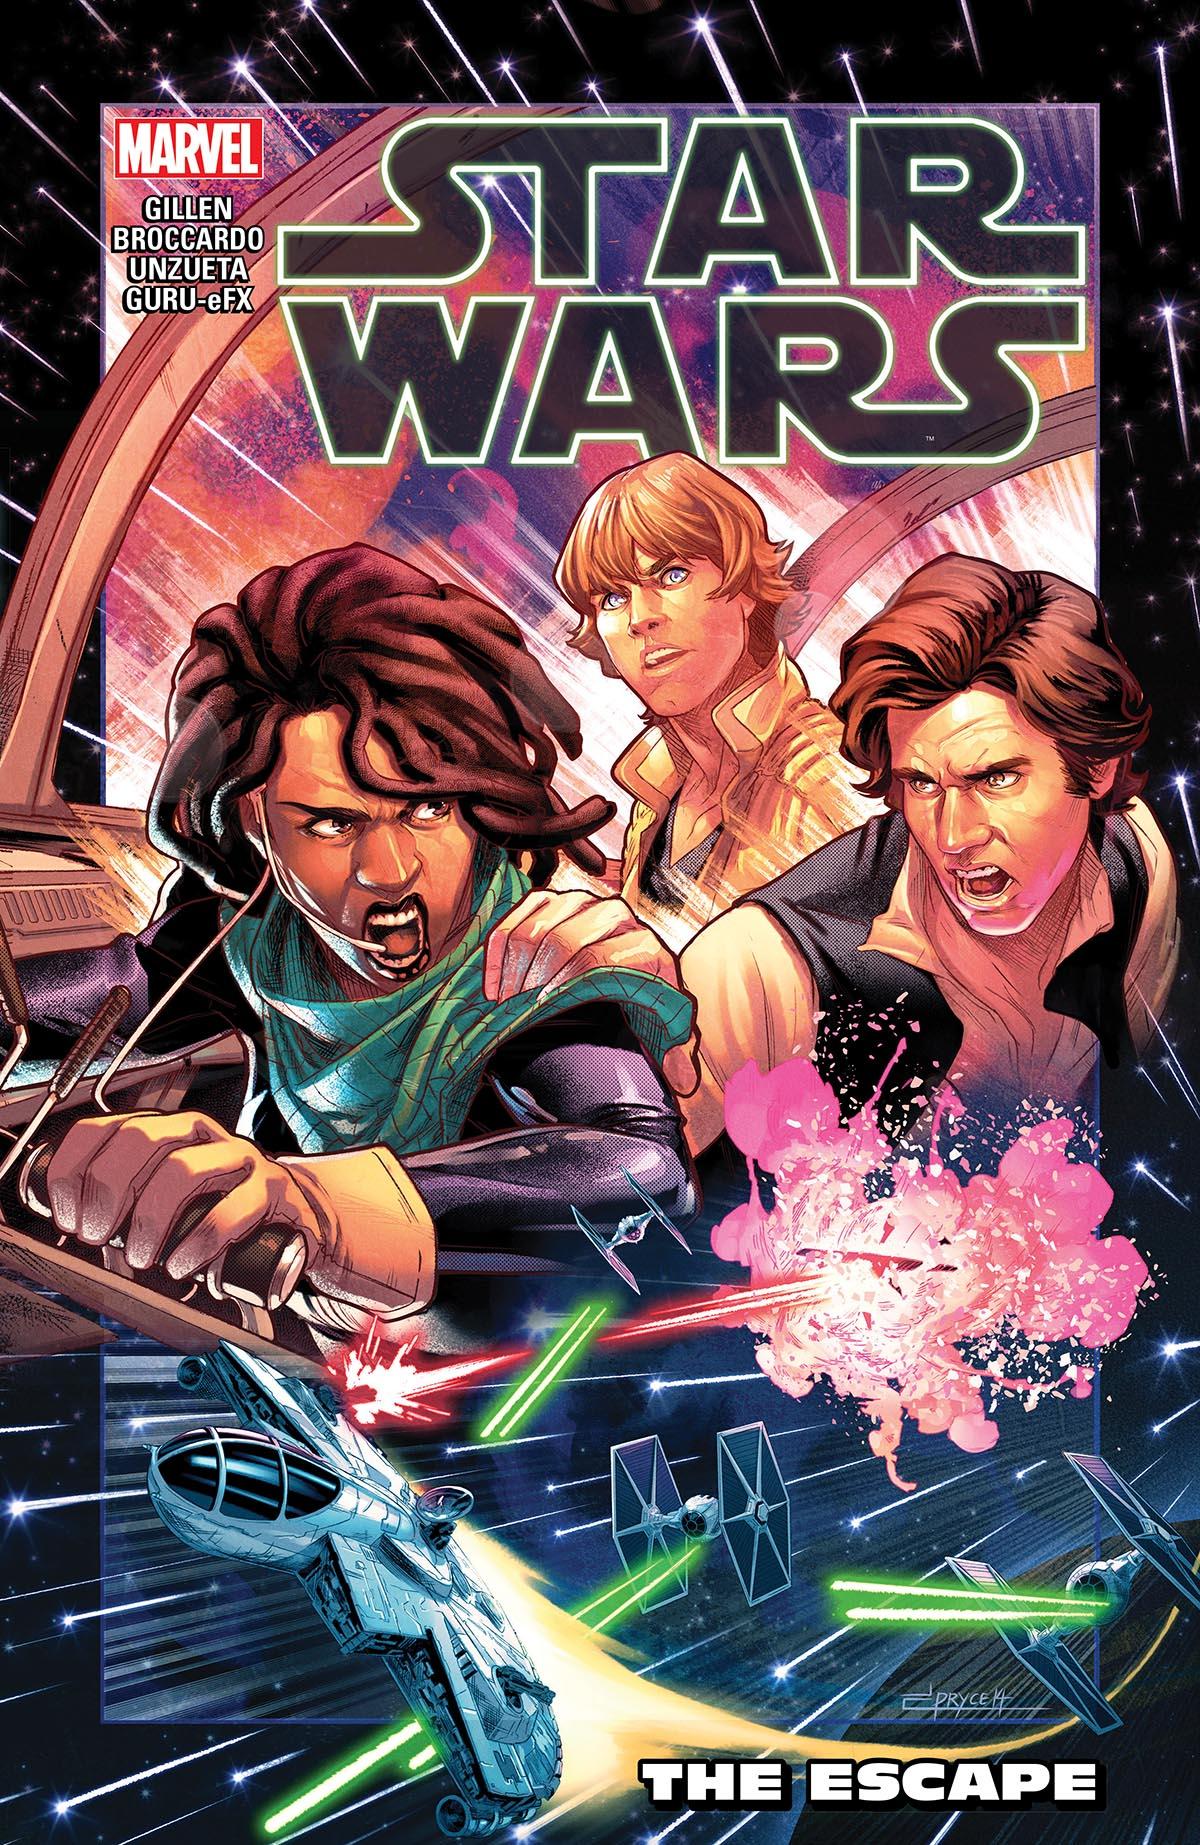 Звёздные войны: Выпуск 10 — Побег